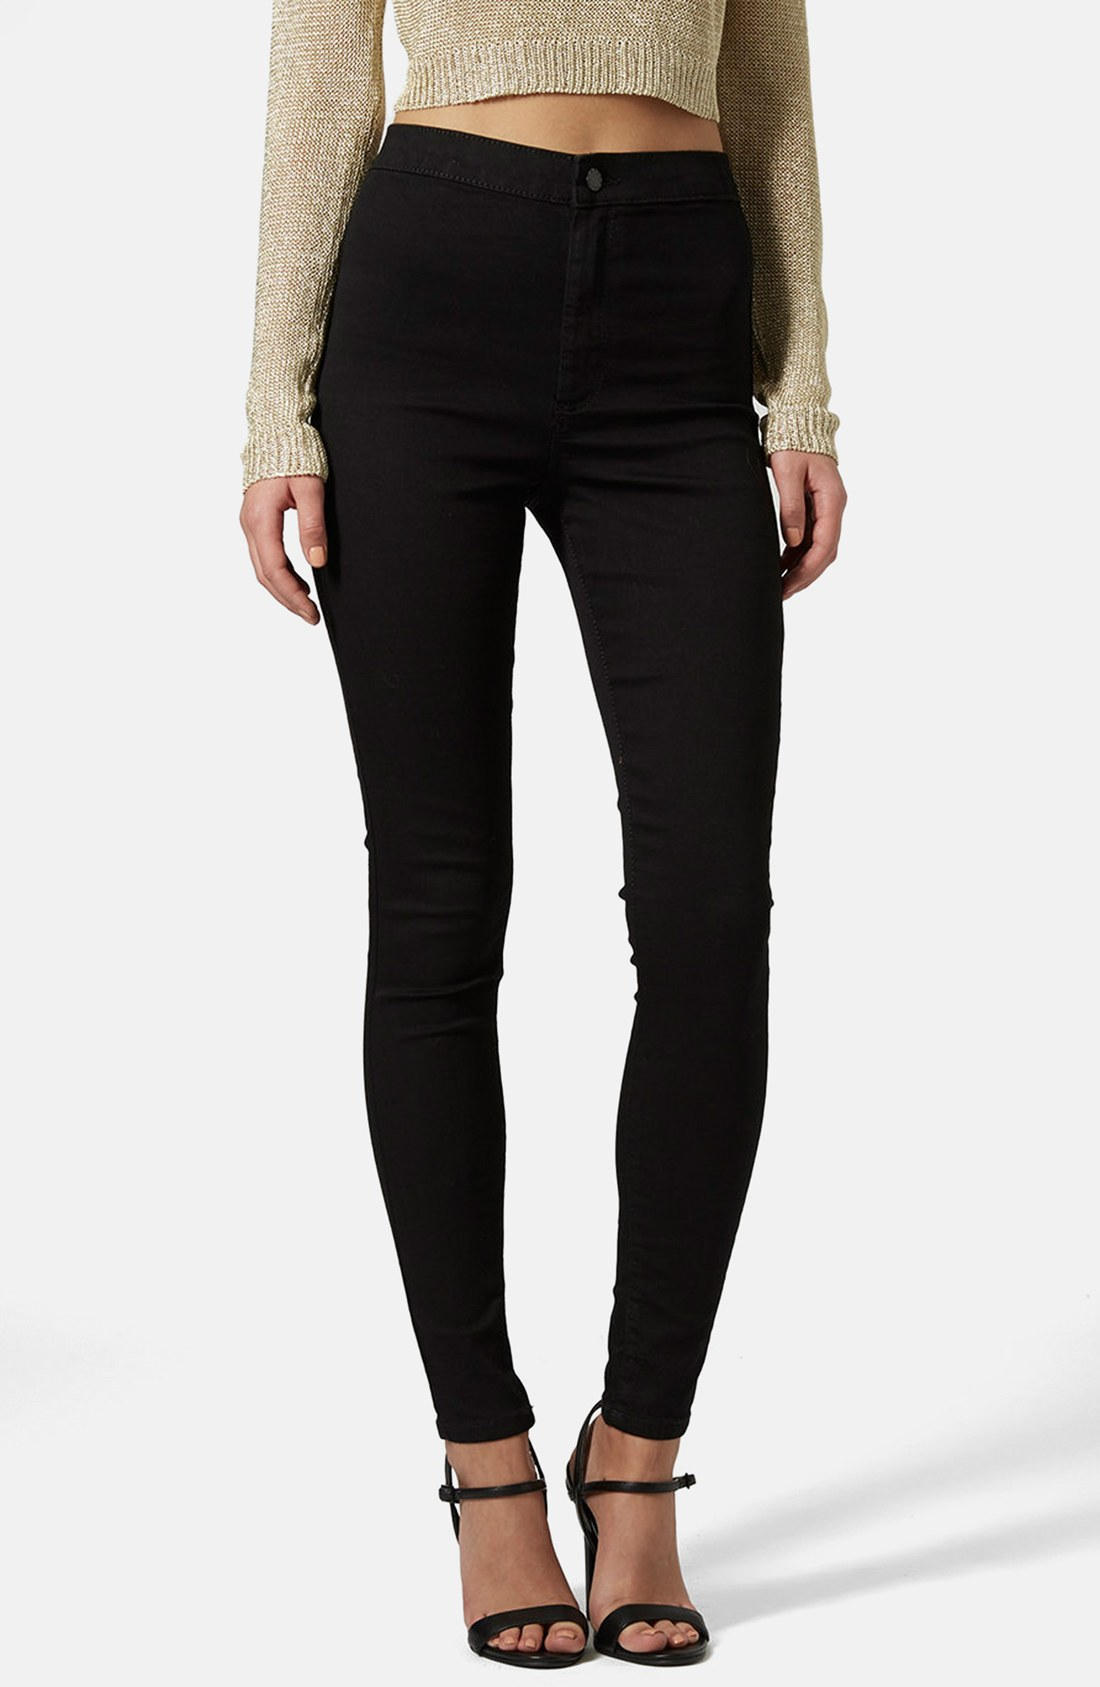 black skinny jeans topshop joni high waist ankle skinny jeans | nordstrom INDWAAZ